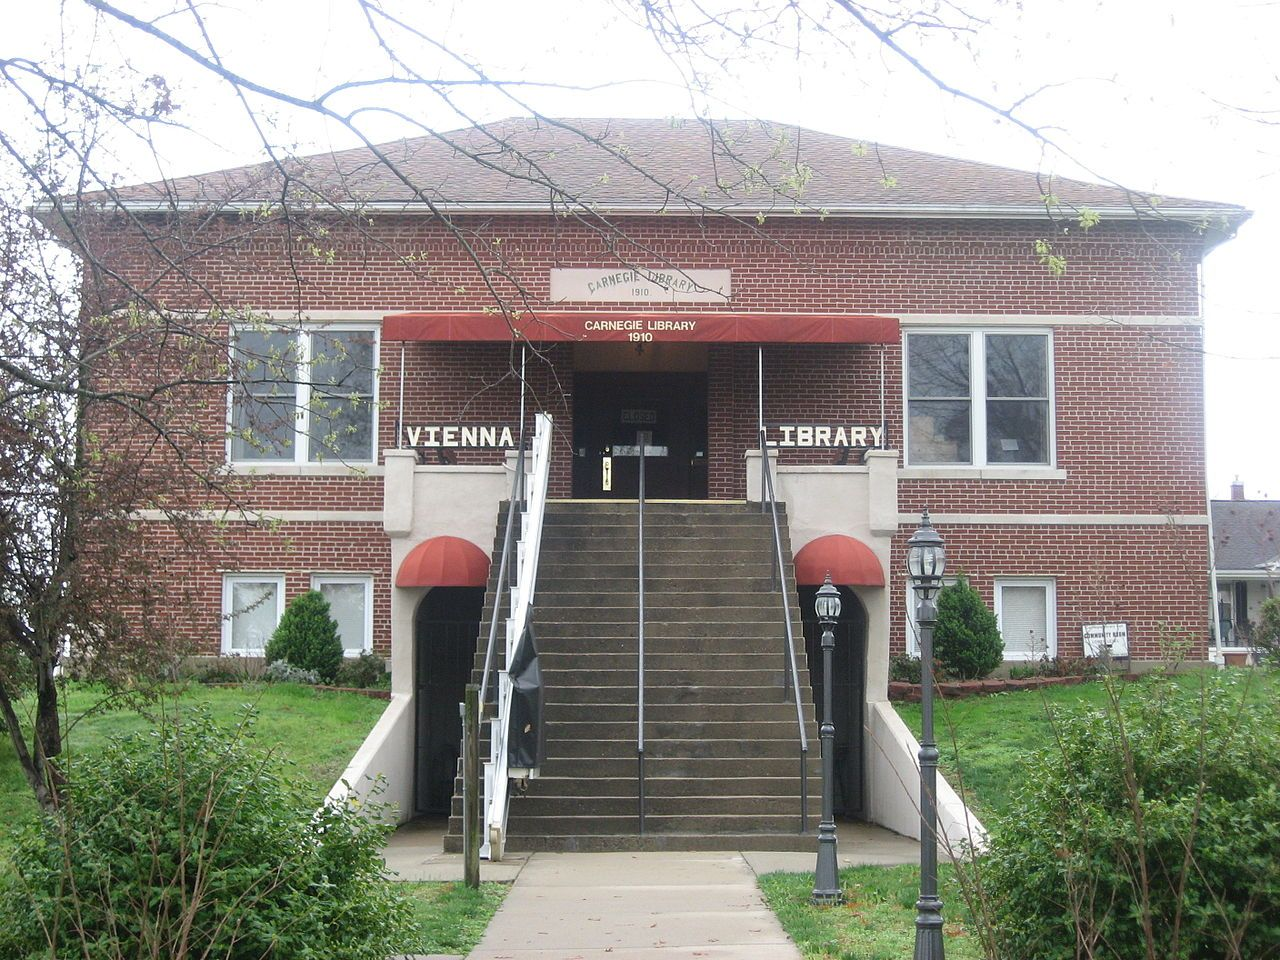 Vienna Public Library in Johnson County, Illinois.